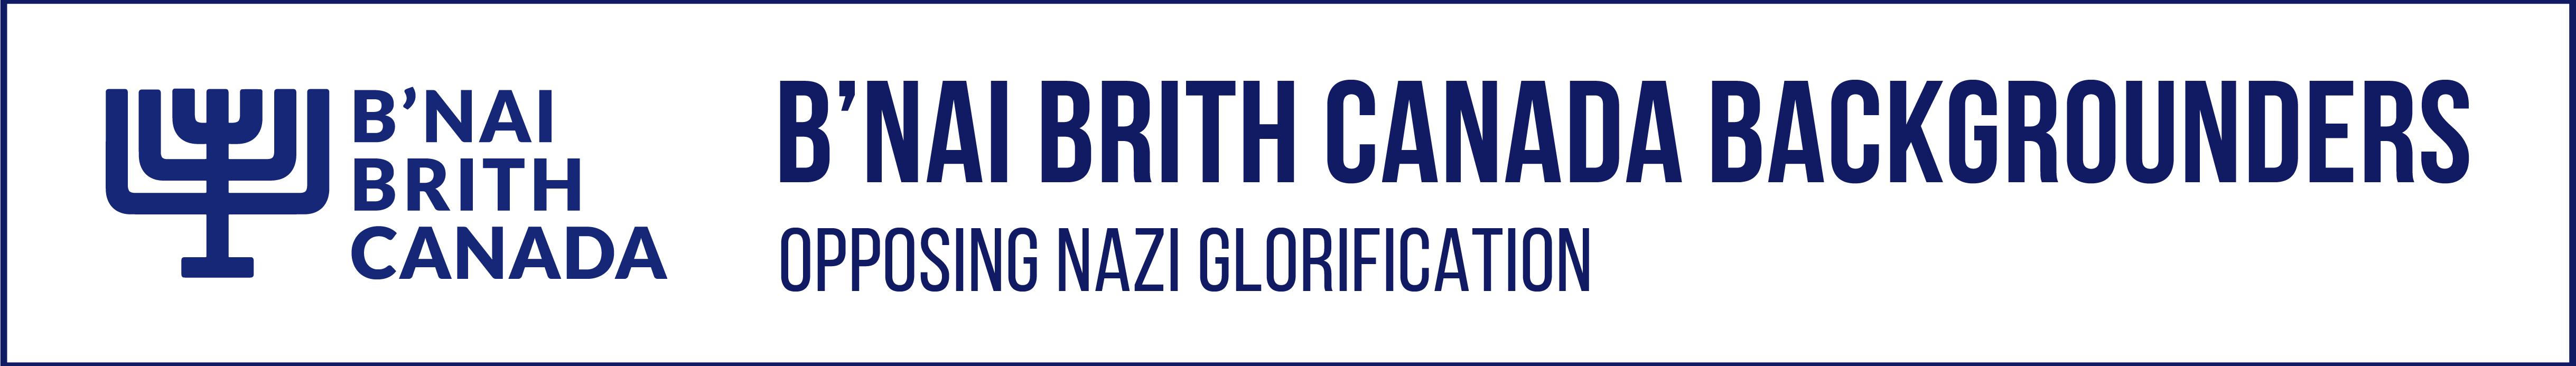 B'nai Brith Backgrounders: Opposing Nazi Glorification